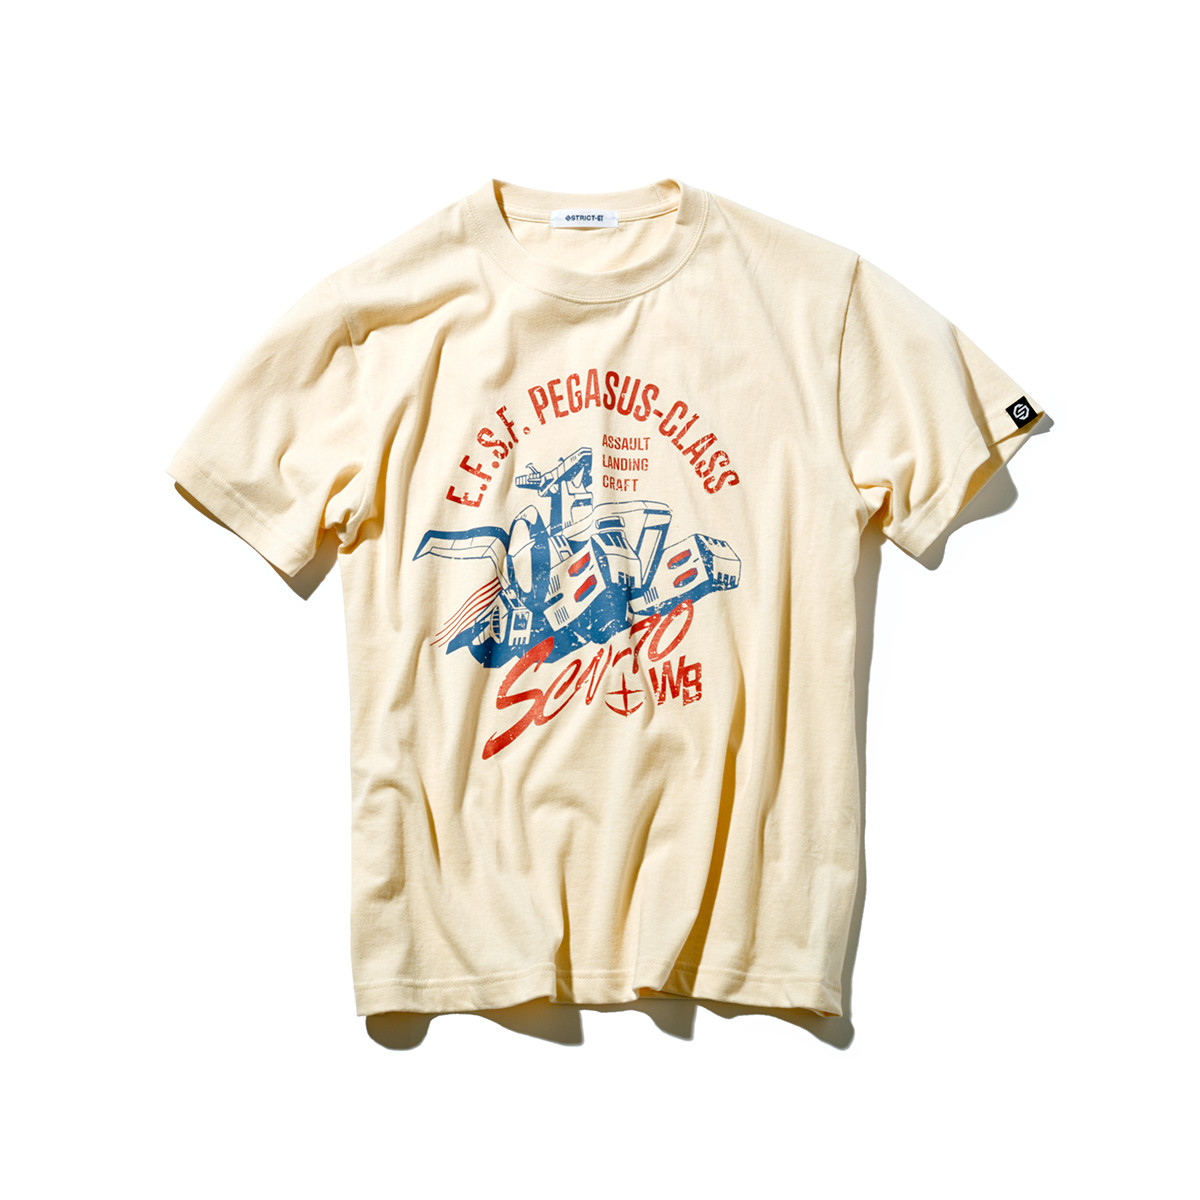 STRICT-G 「MOBILE SUIT GUNDAM」WHITE BASE T-SHIRT